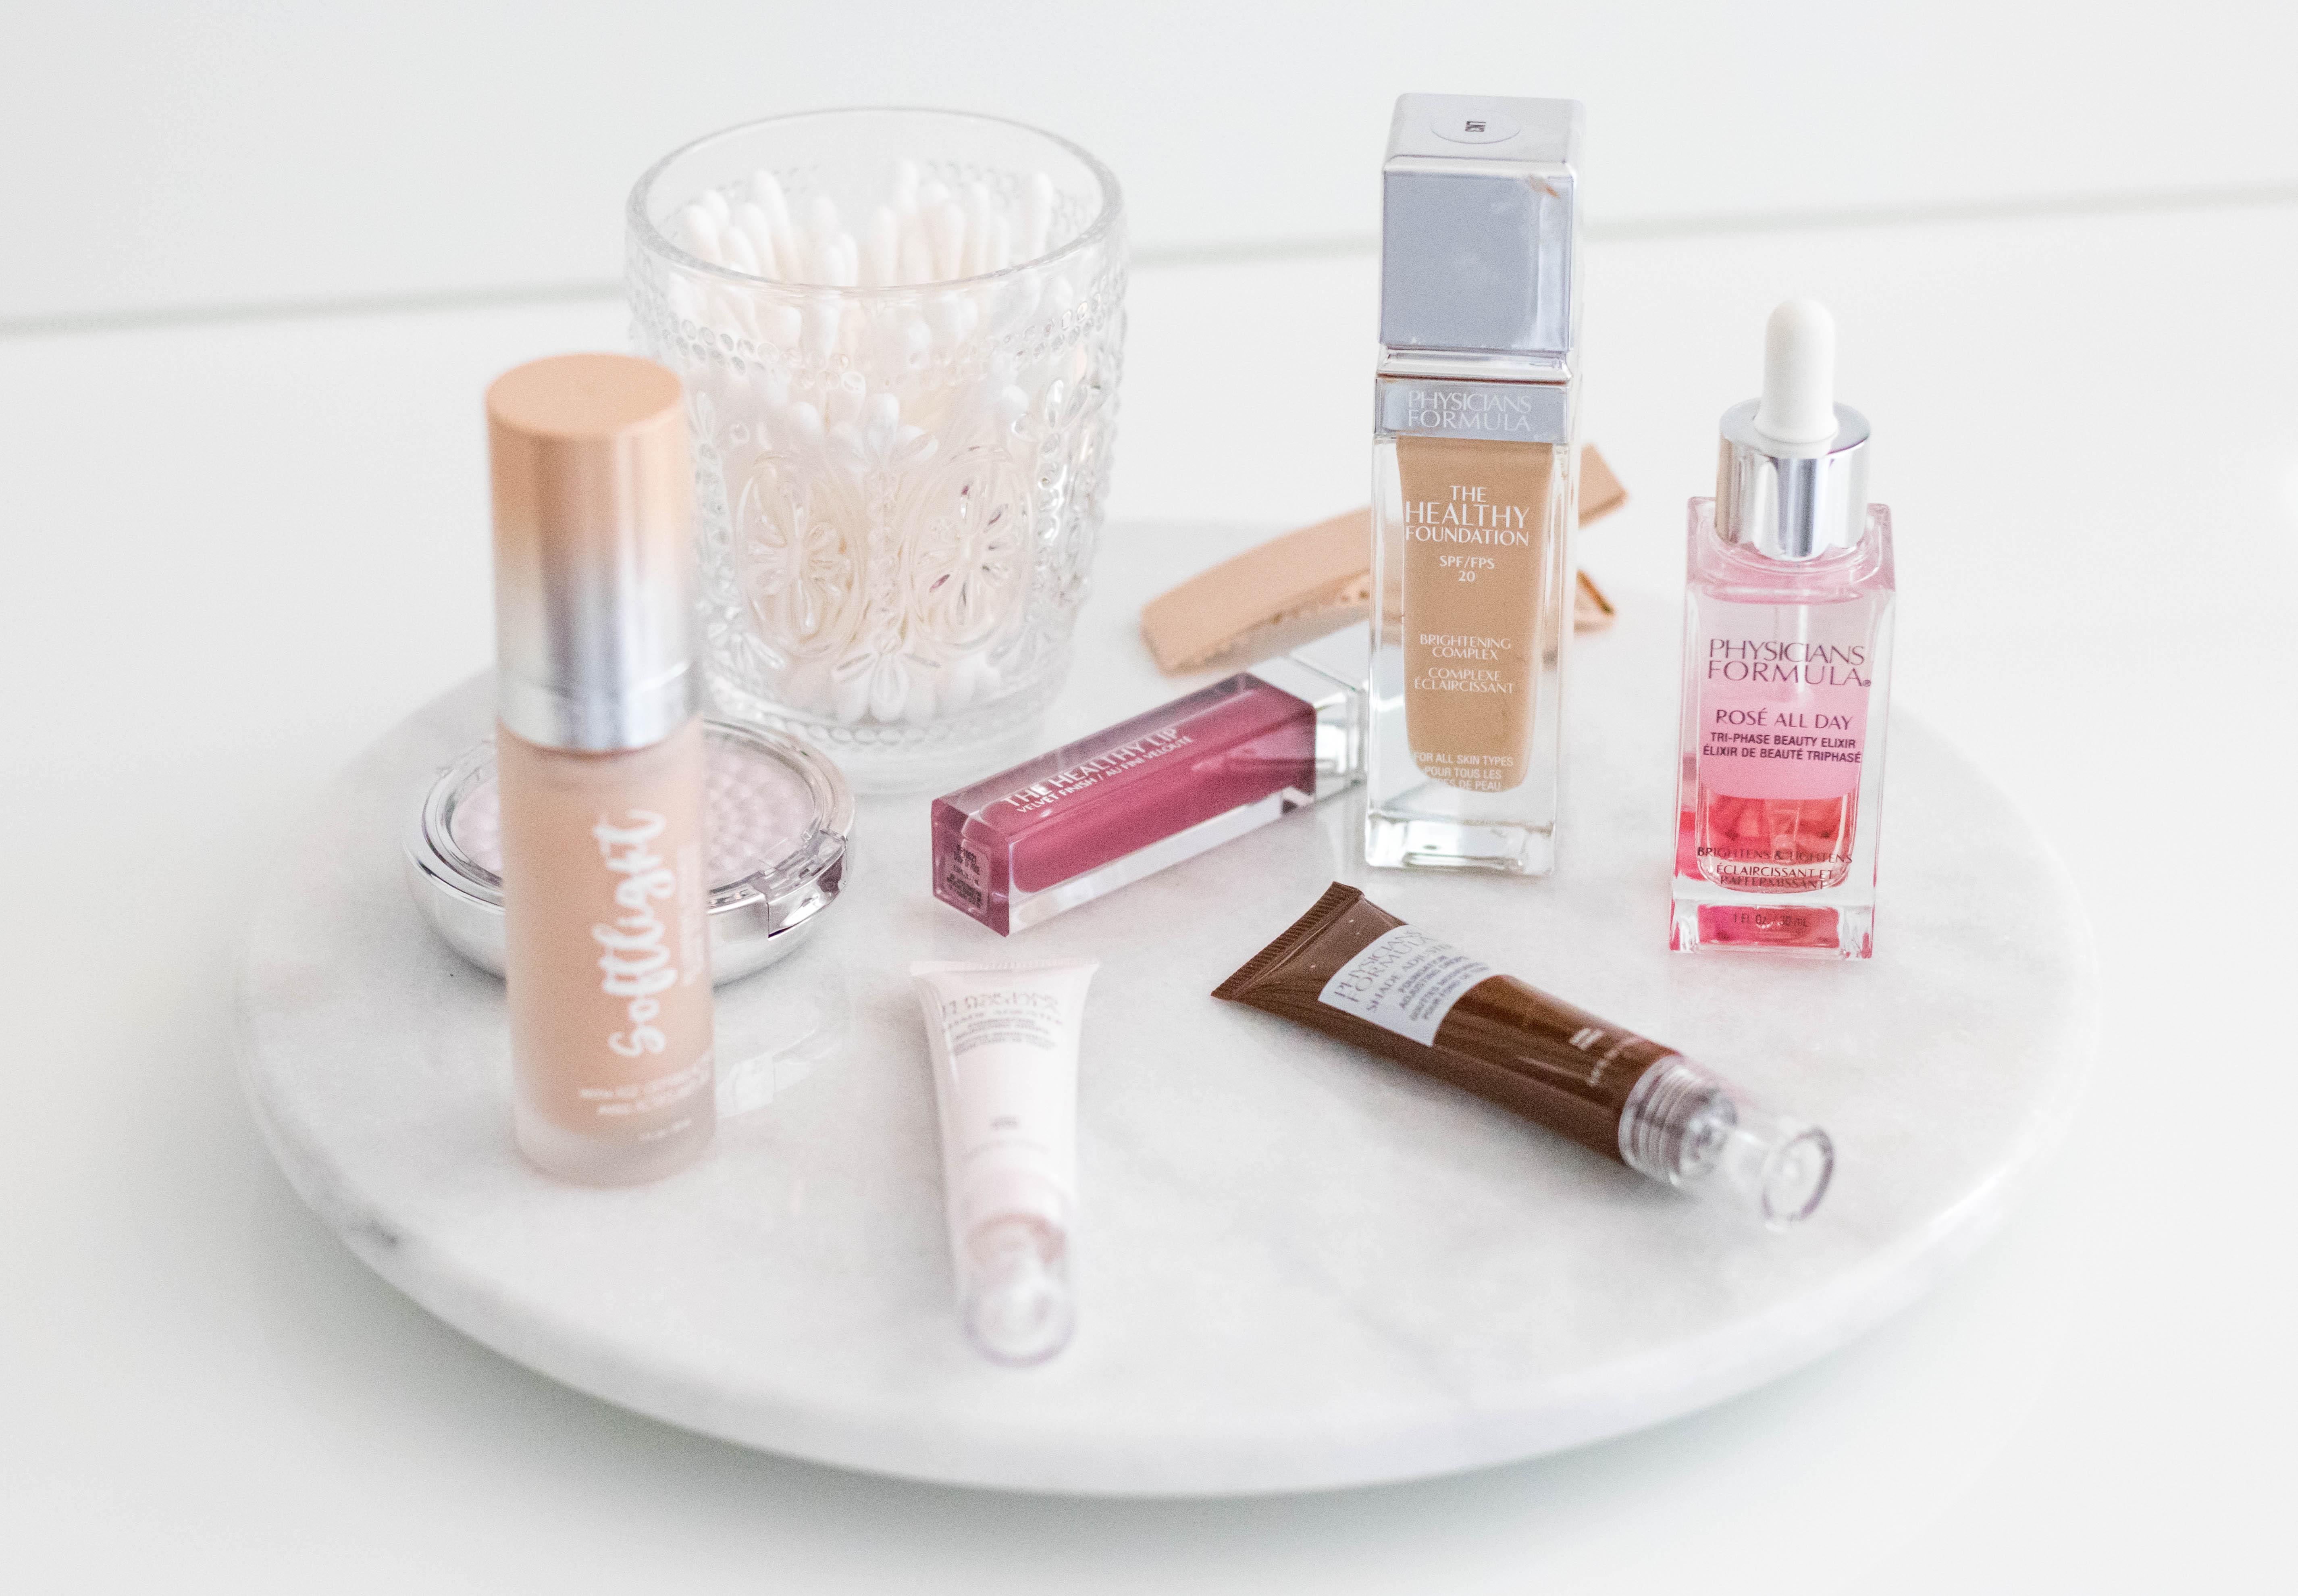 how to get glowing skin physicians formula #physiciansformula #walgreensbeauty #makeup